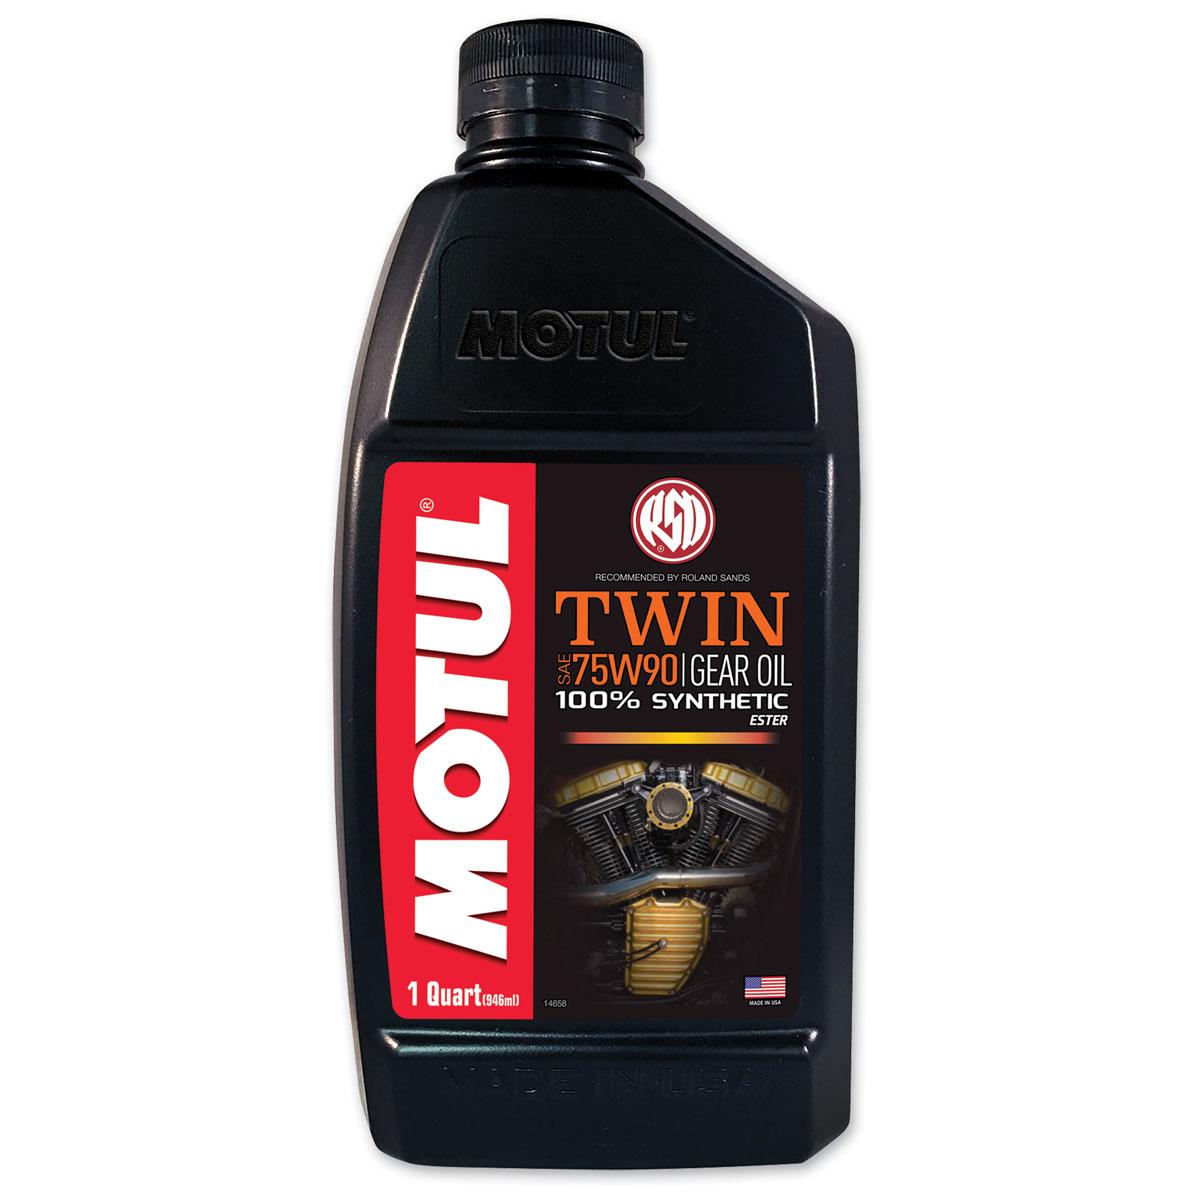 MOTUL RSD 75W90 Synthetic Transmission Gear Oil Quart - 108064